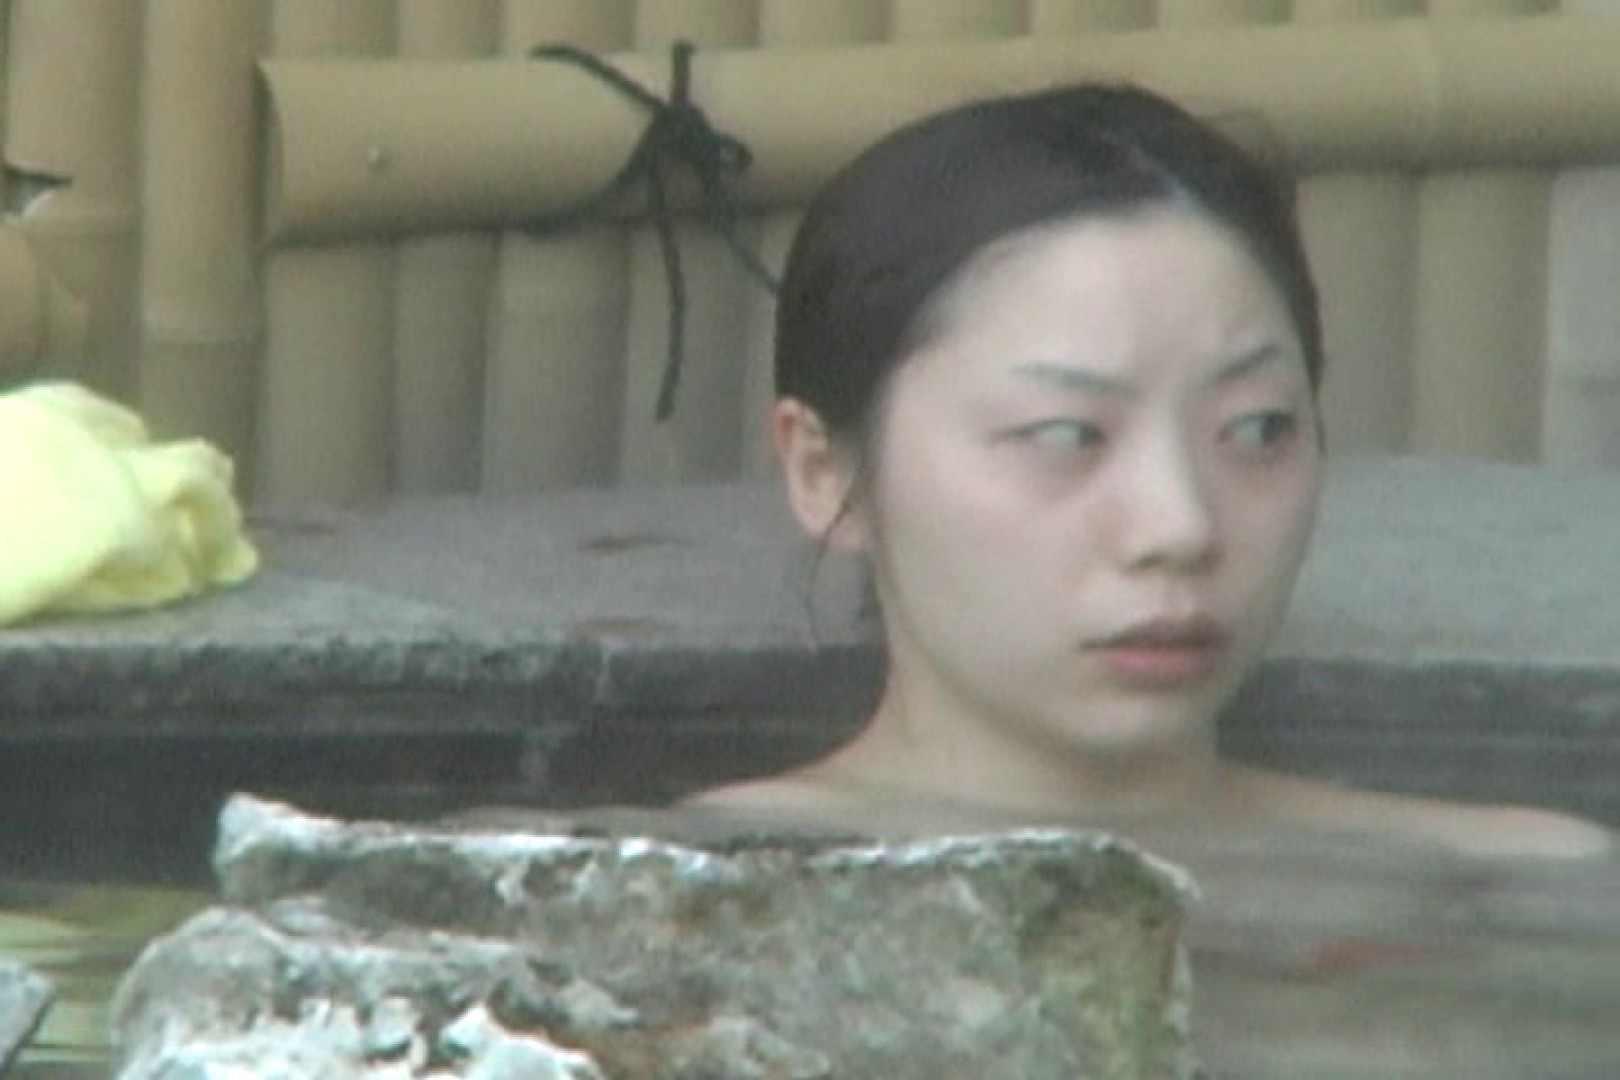 Aquaな露天風呂Vol.596 盗撮シリーズ | 露天風呂編  113PIX 27